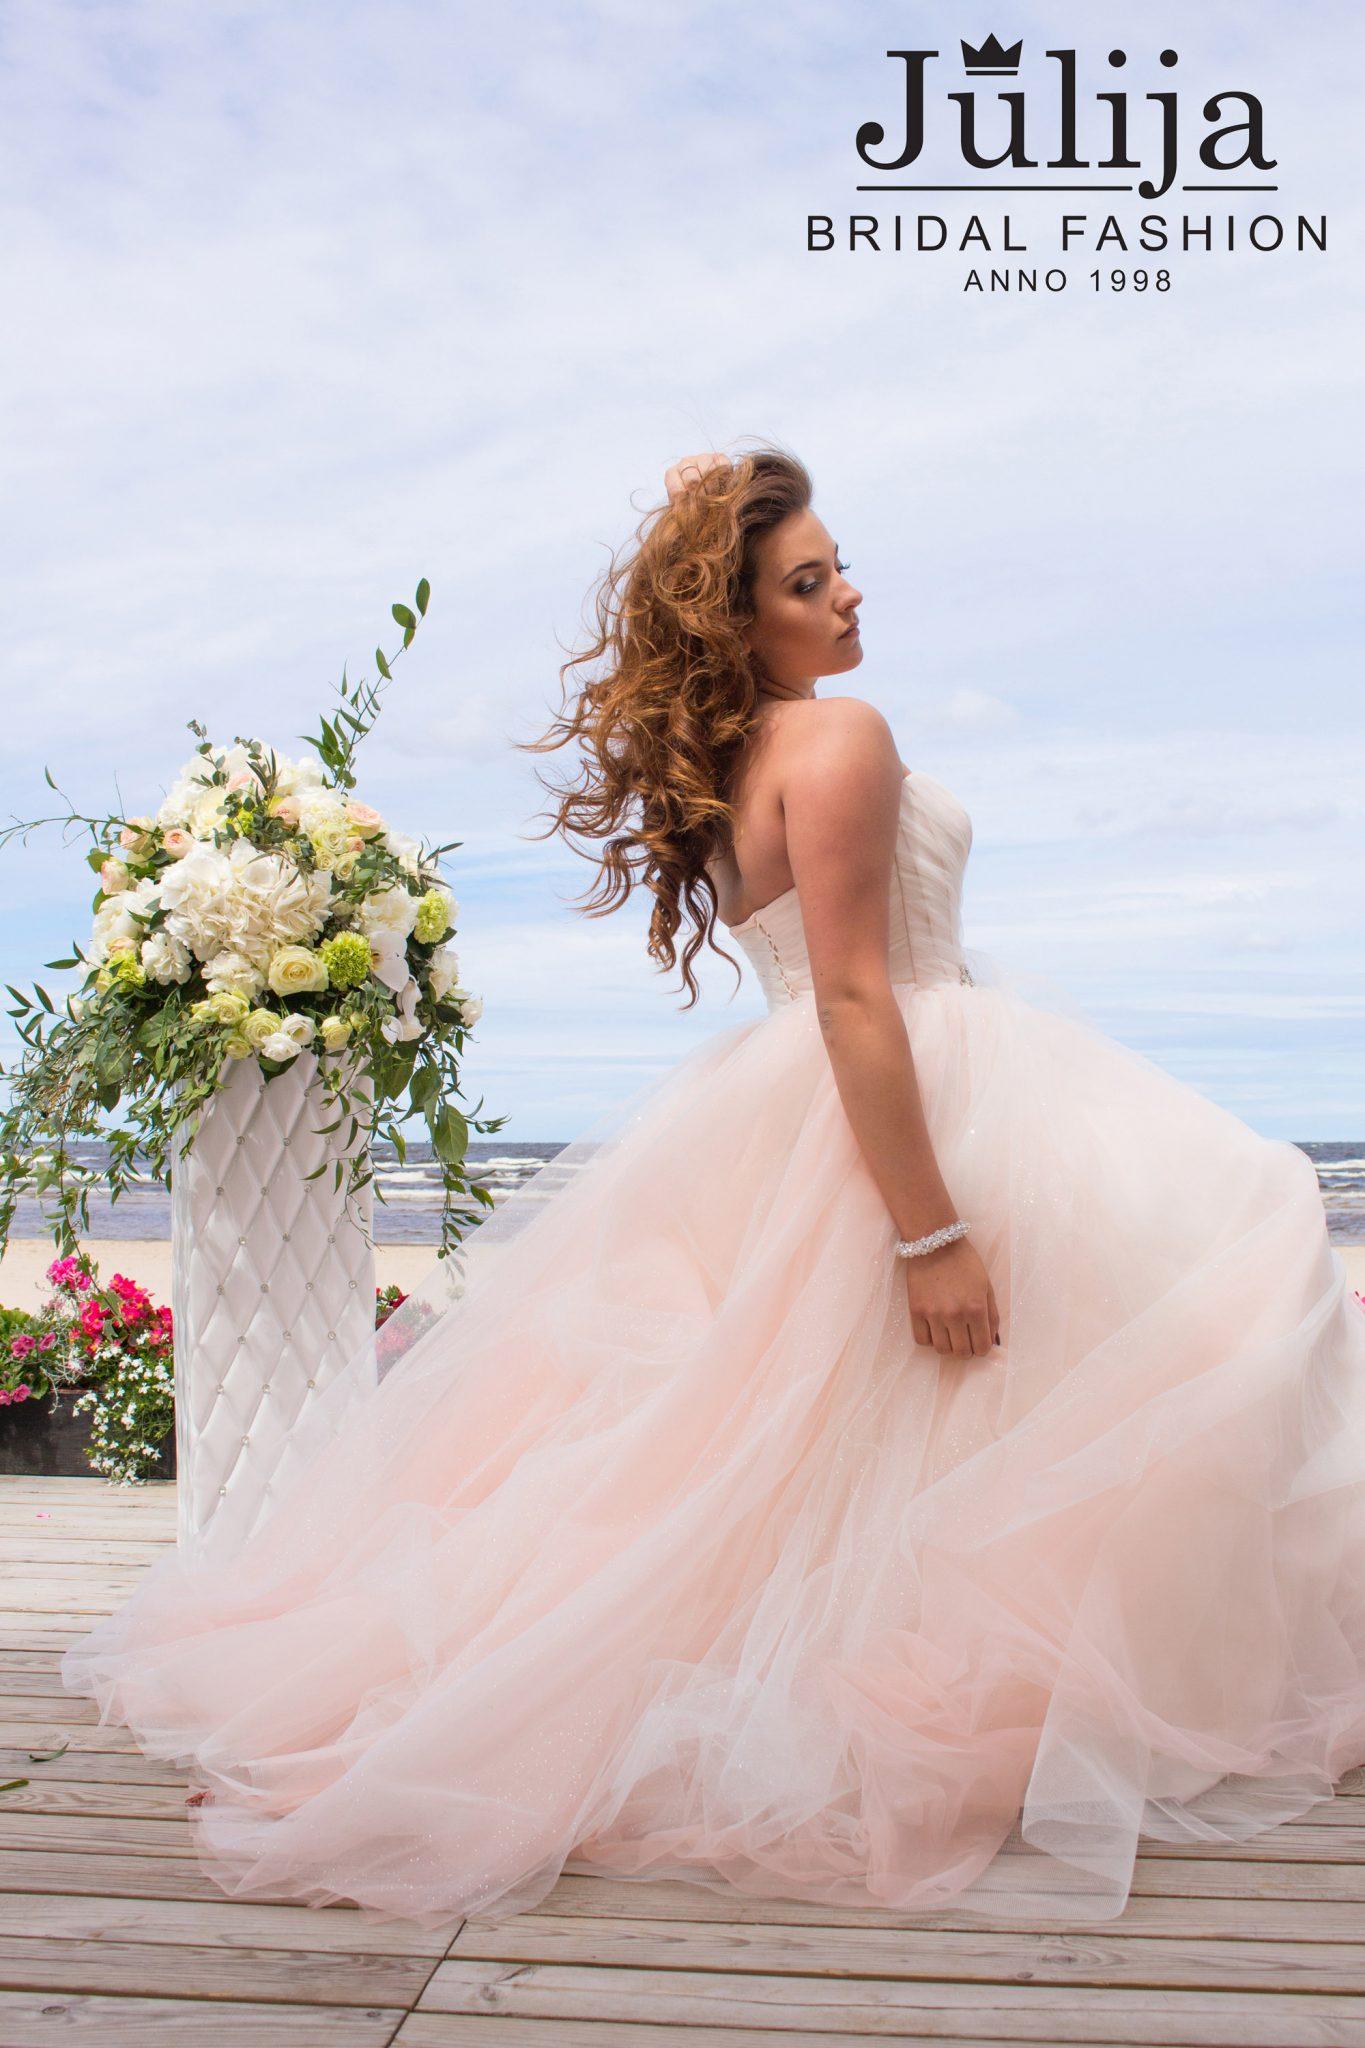 wedding dresses 2018 1 / 2 | Wholesale wedding dresses - Julija ...